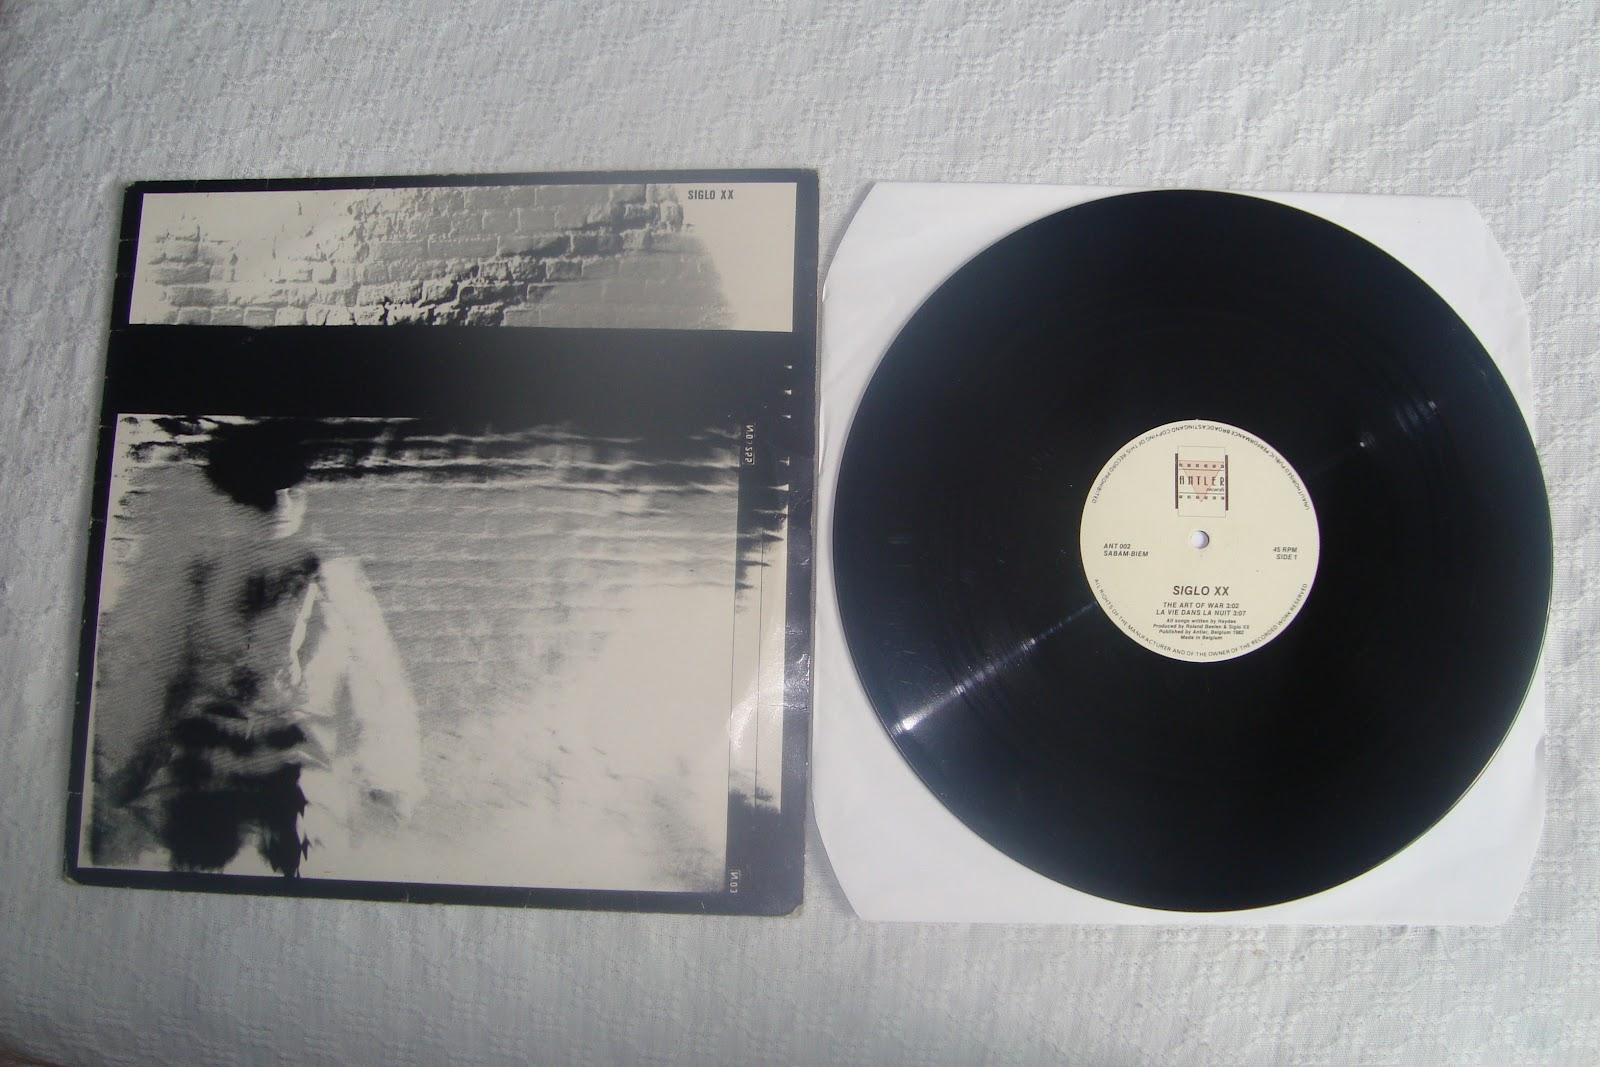 Siglo XX - Antler Tracks I